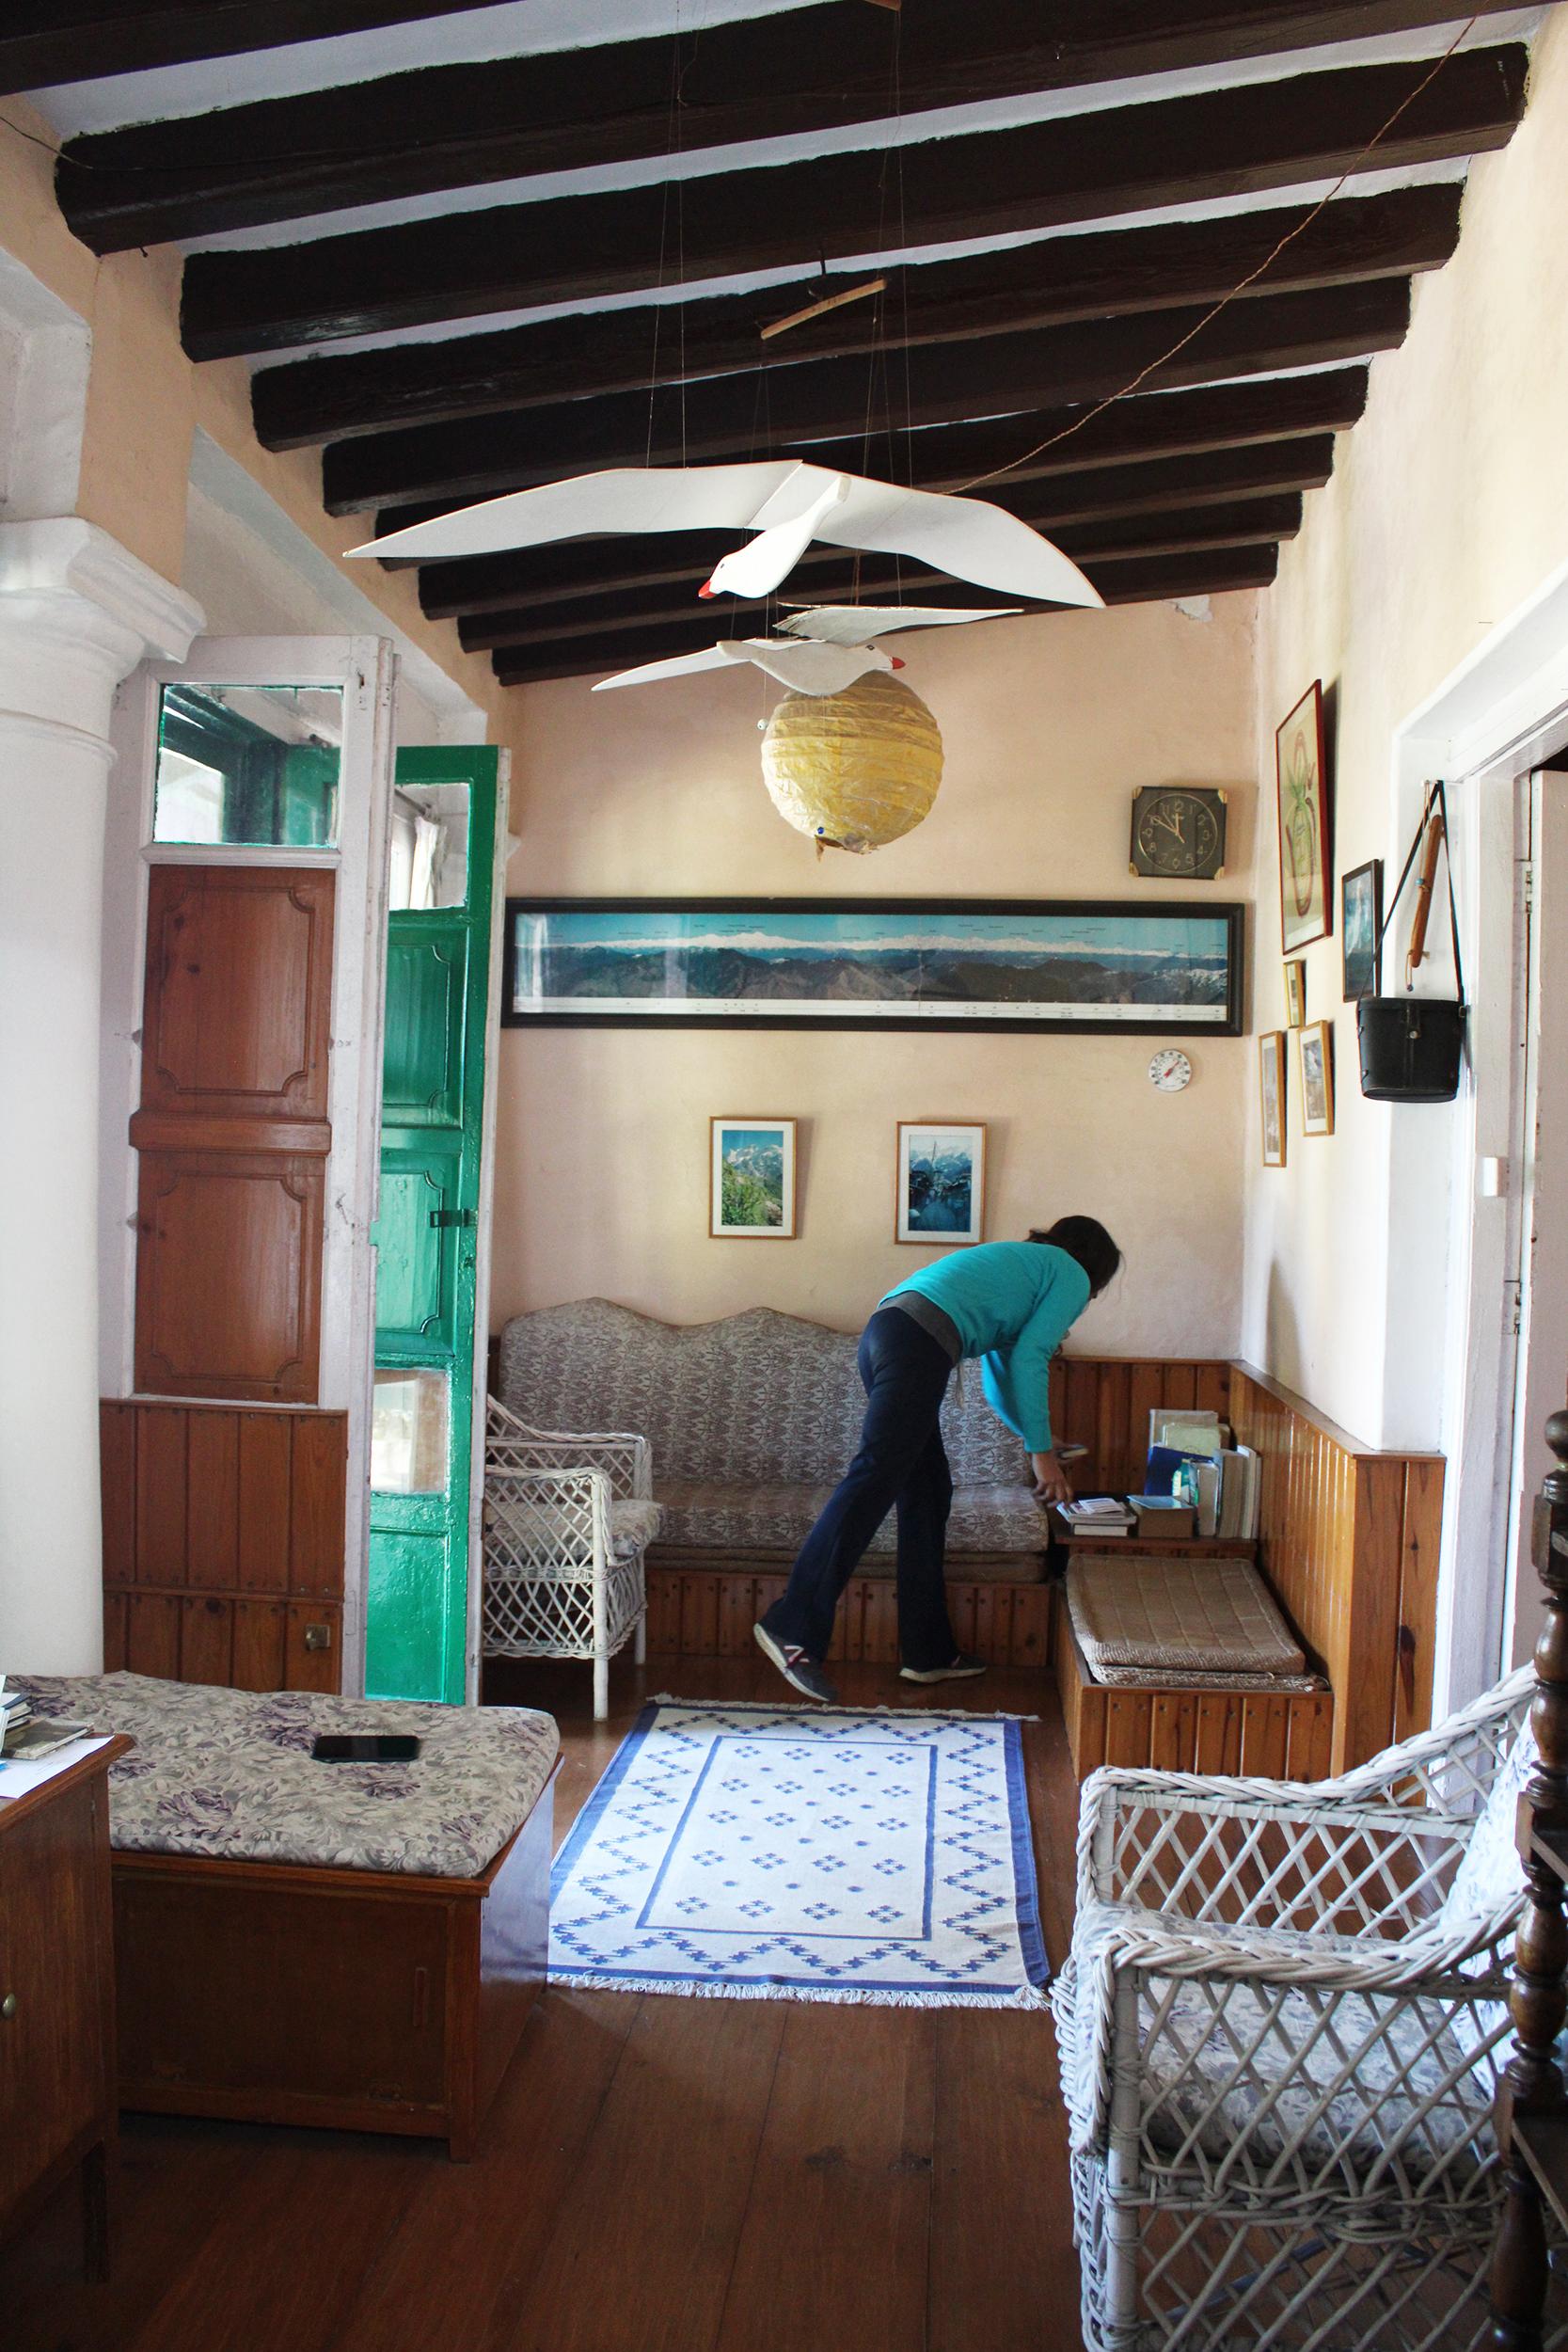 mountain homes, indian interiors, natural design, outdoors, eco friendly design, green design, landour house